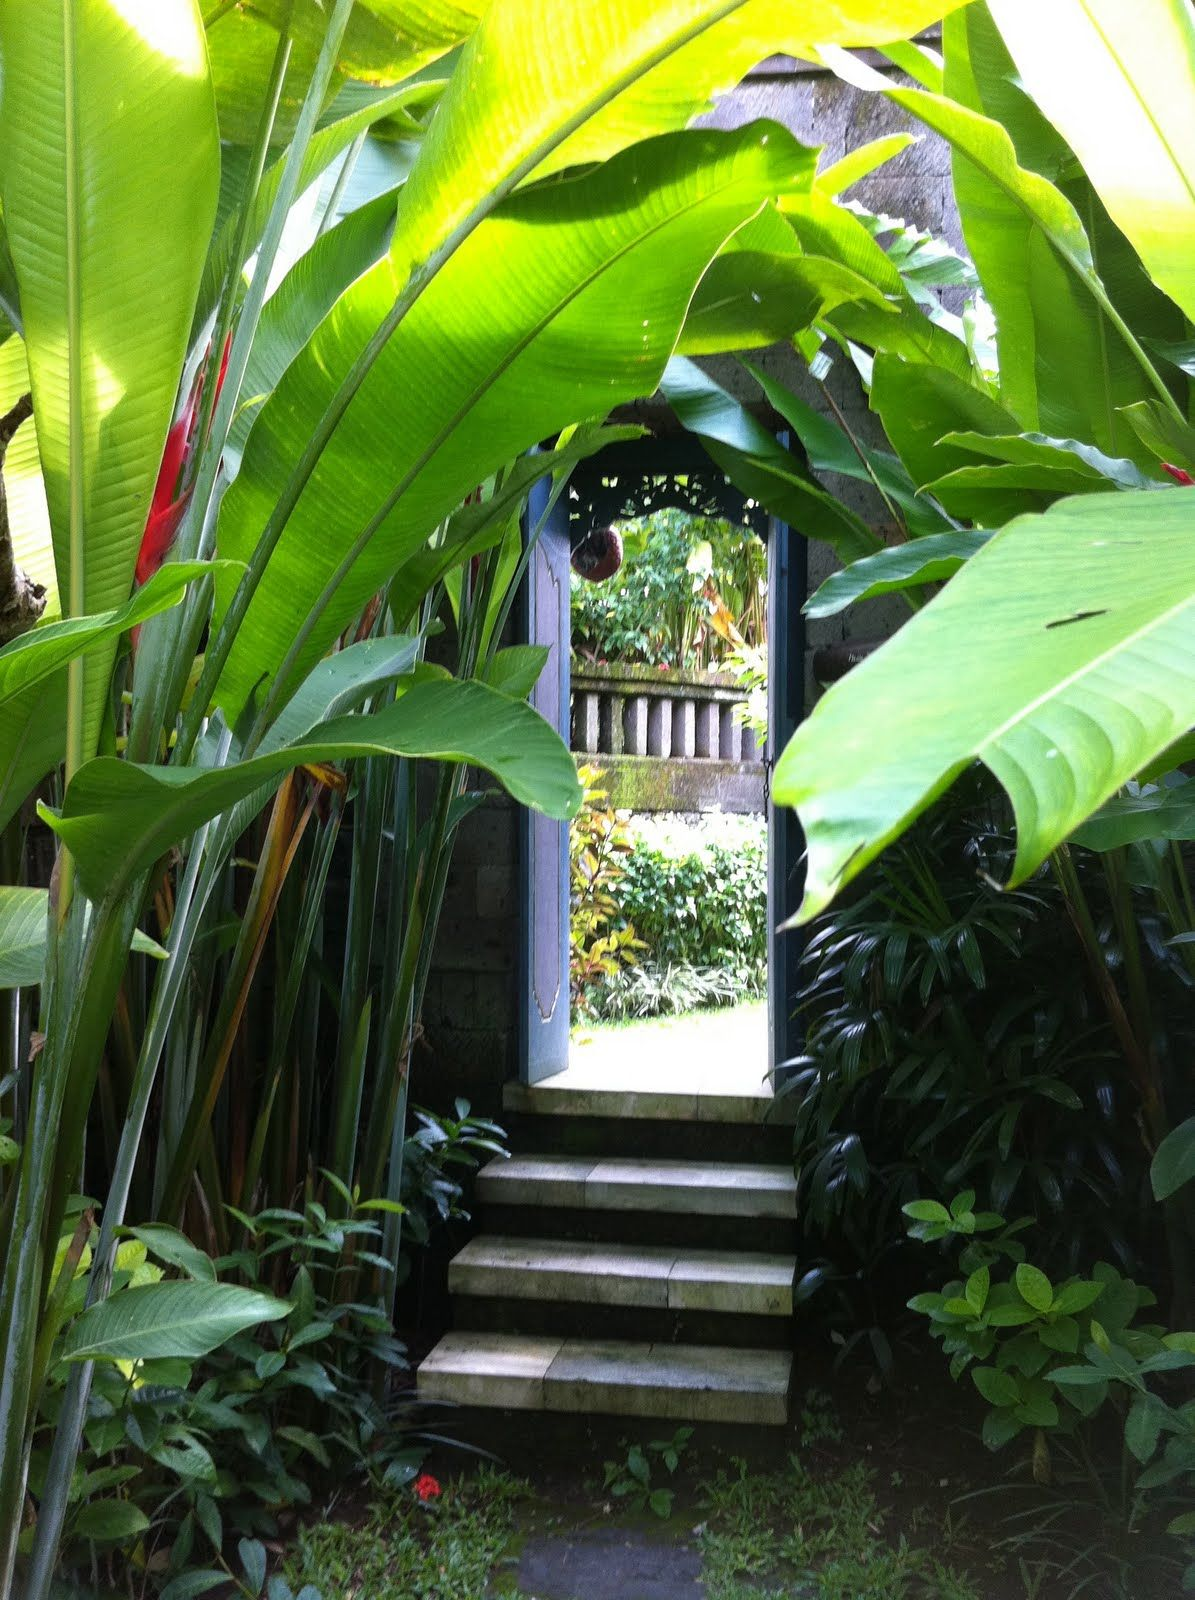 bali landscape | Du Monde: Bali Gardens | wish list for yard ...